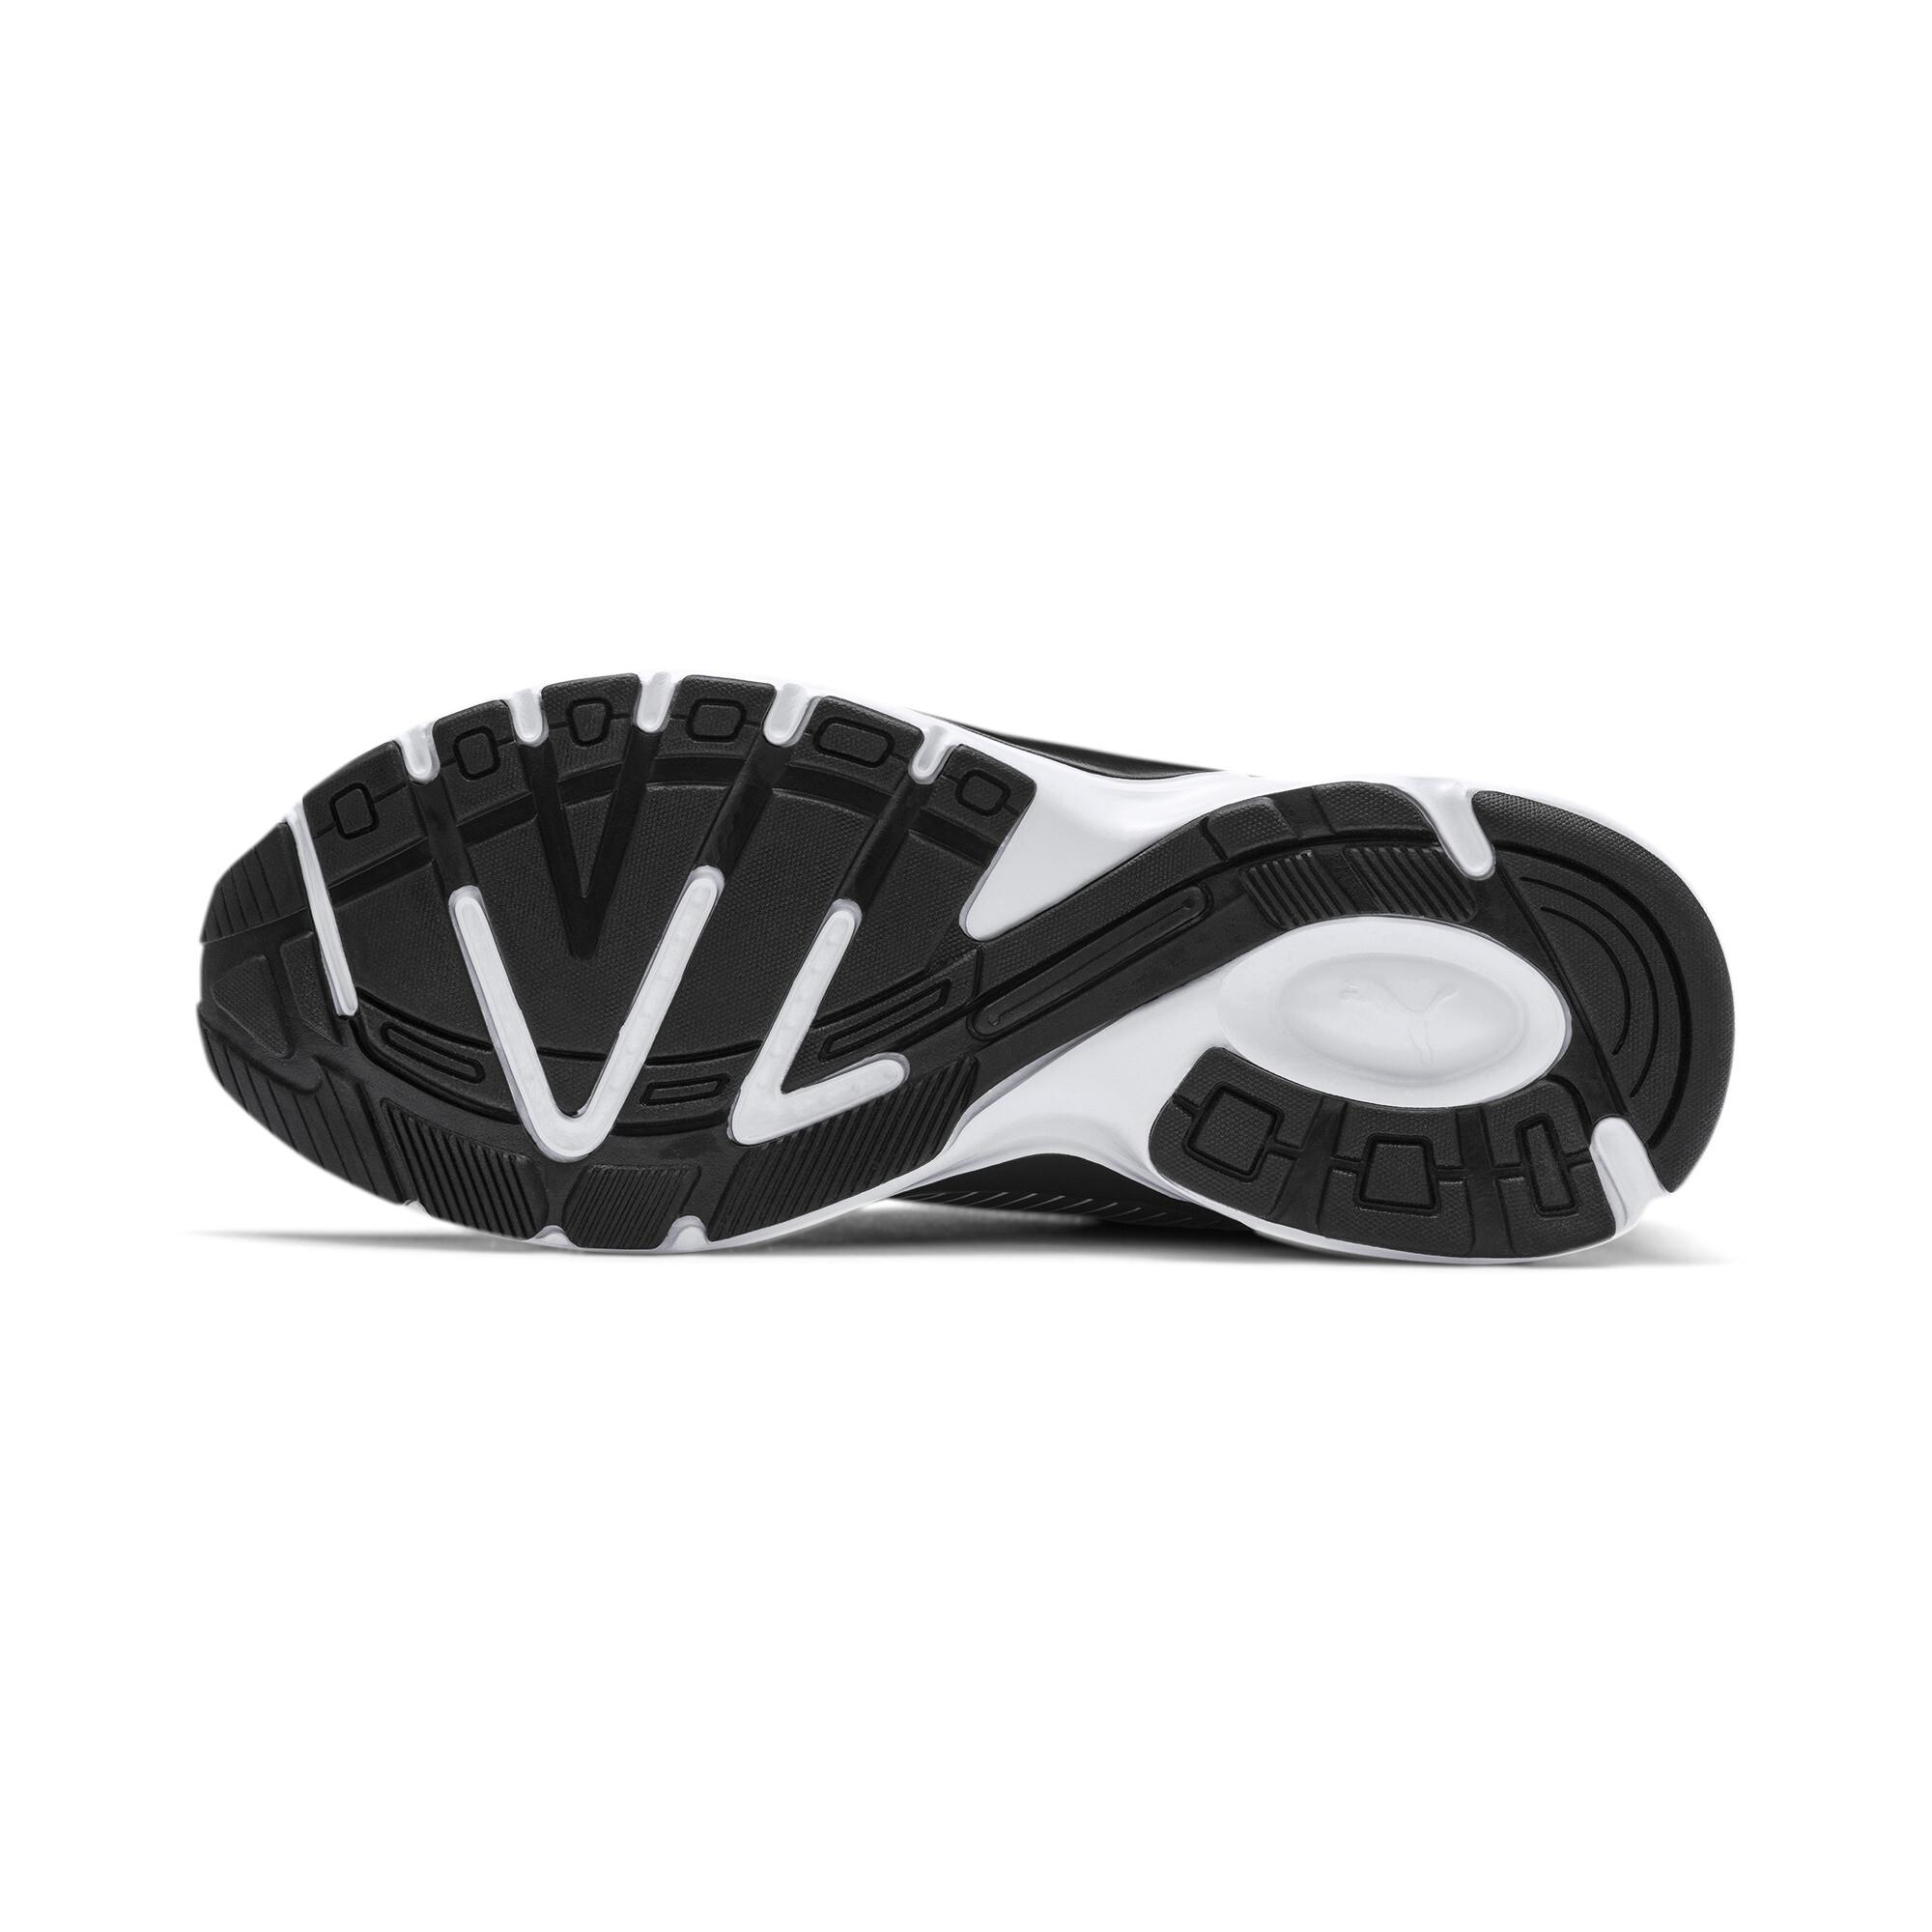 PUMA-Future-Runner-SL-Sneaker-Unisex-Schuhe-Basics-Neu Indexbild 5